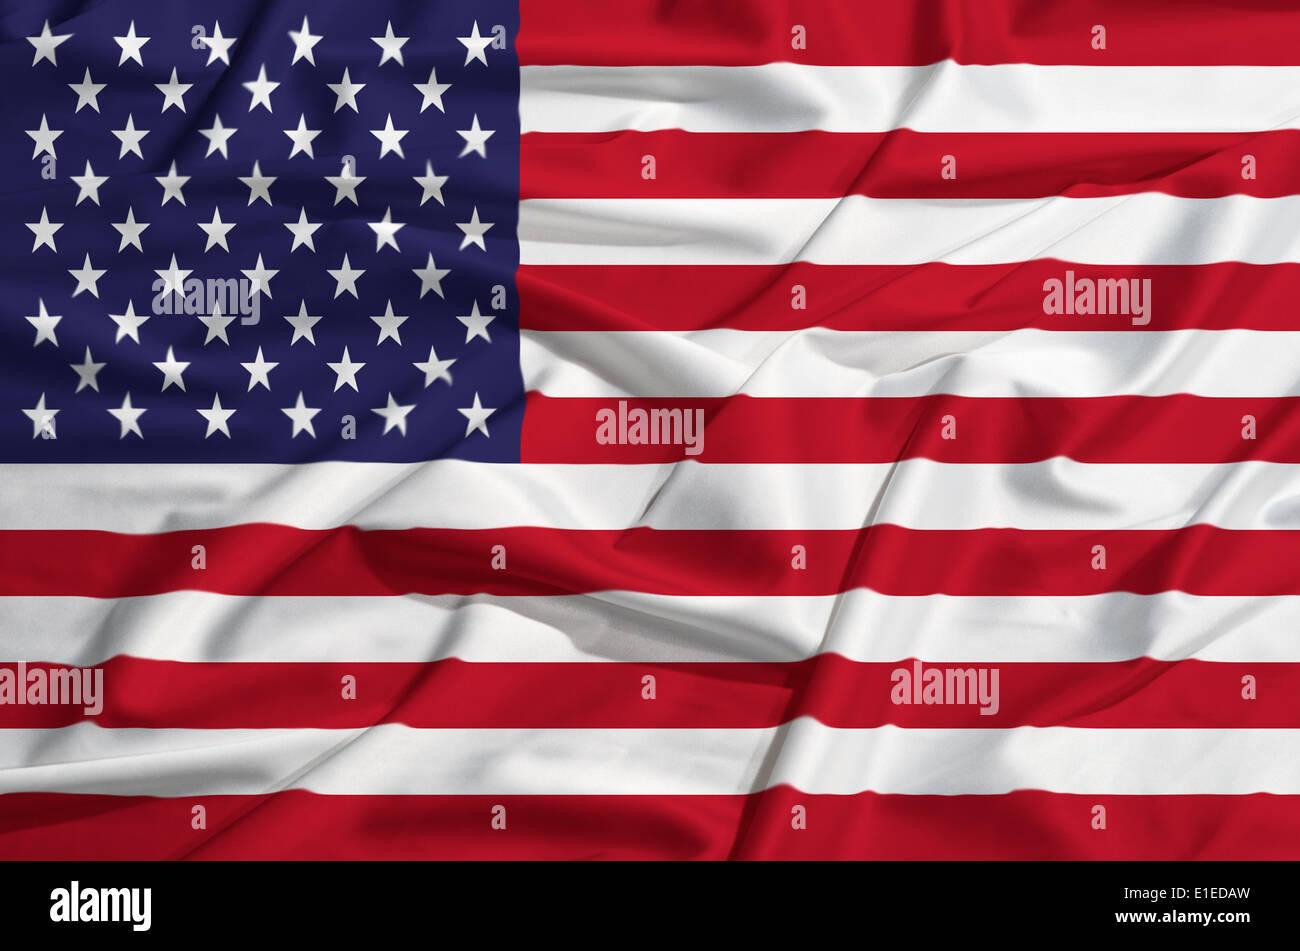 United States flag on a silk drape waving - Stock Image